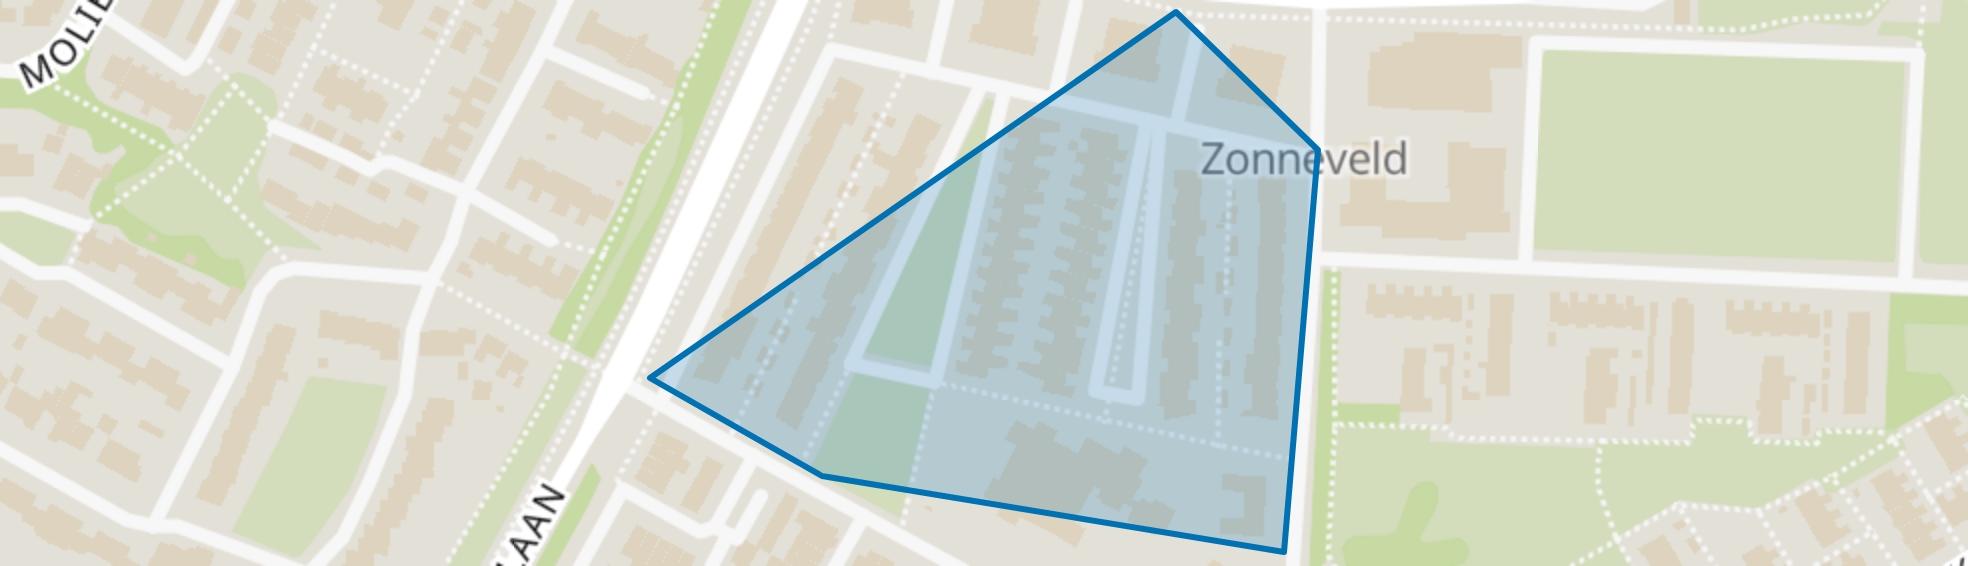 Zonneveld, Venlo map